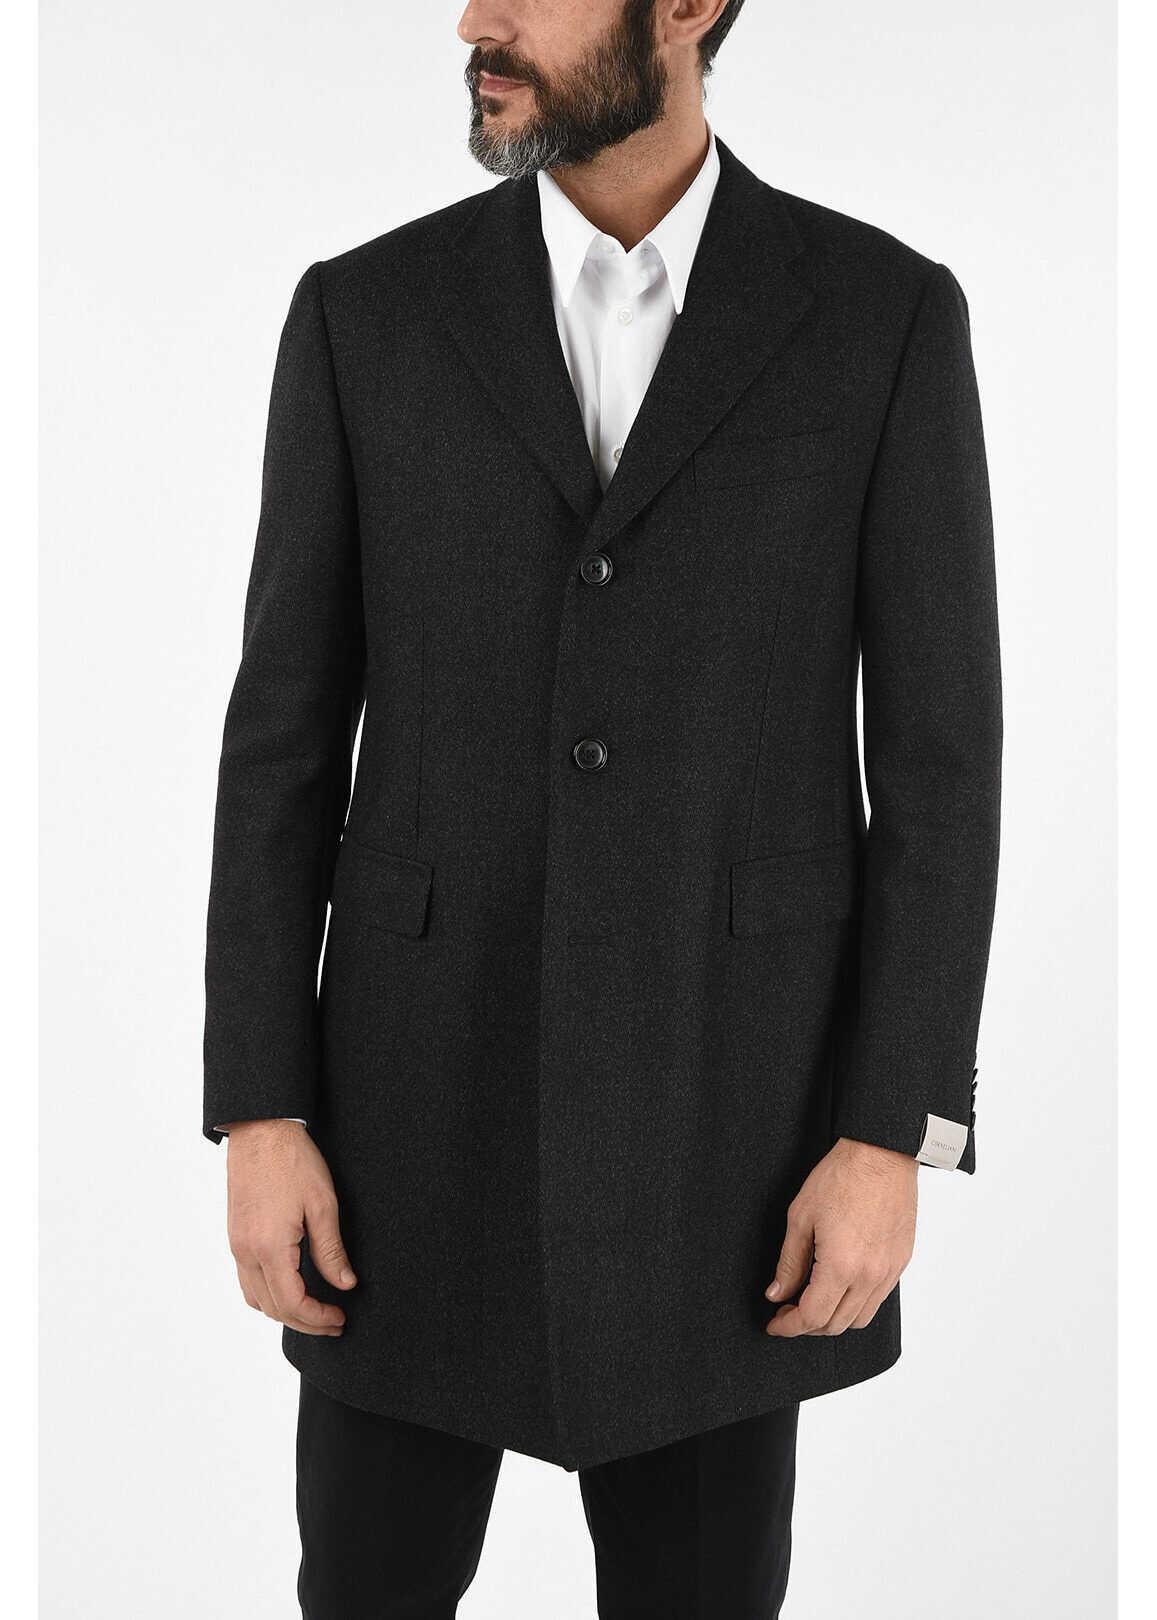 CORNELIANI three-quarter length 3-button chesterfield coat GRAY imagine